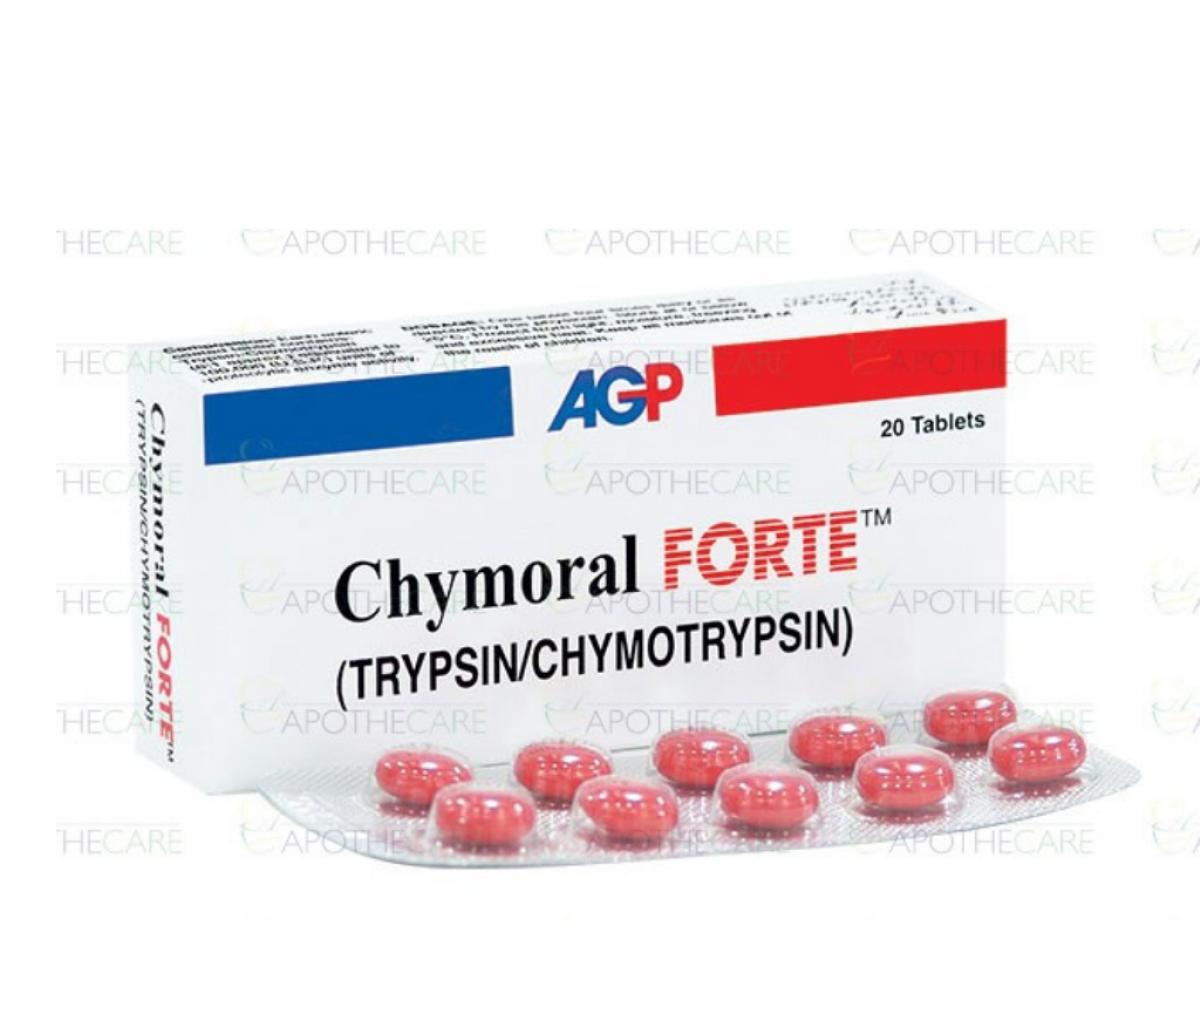 Chymoral Forte